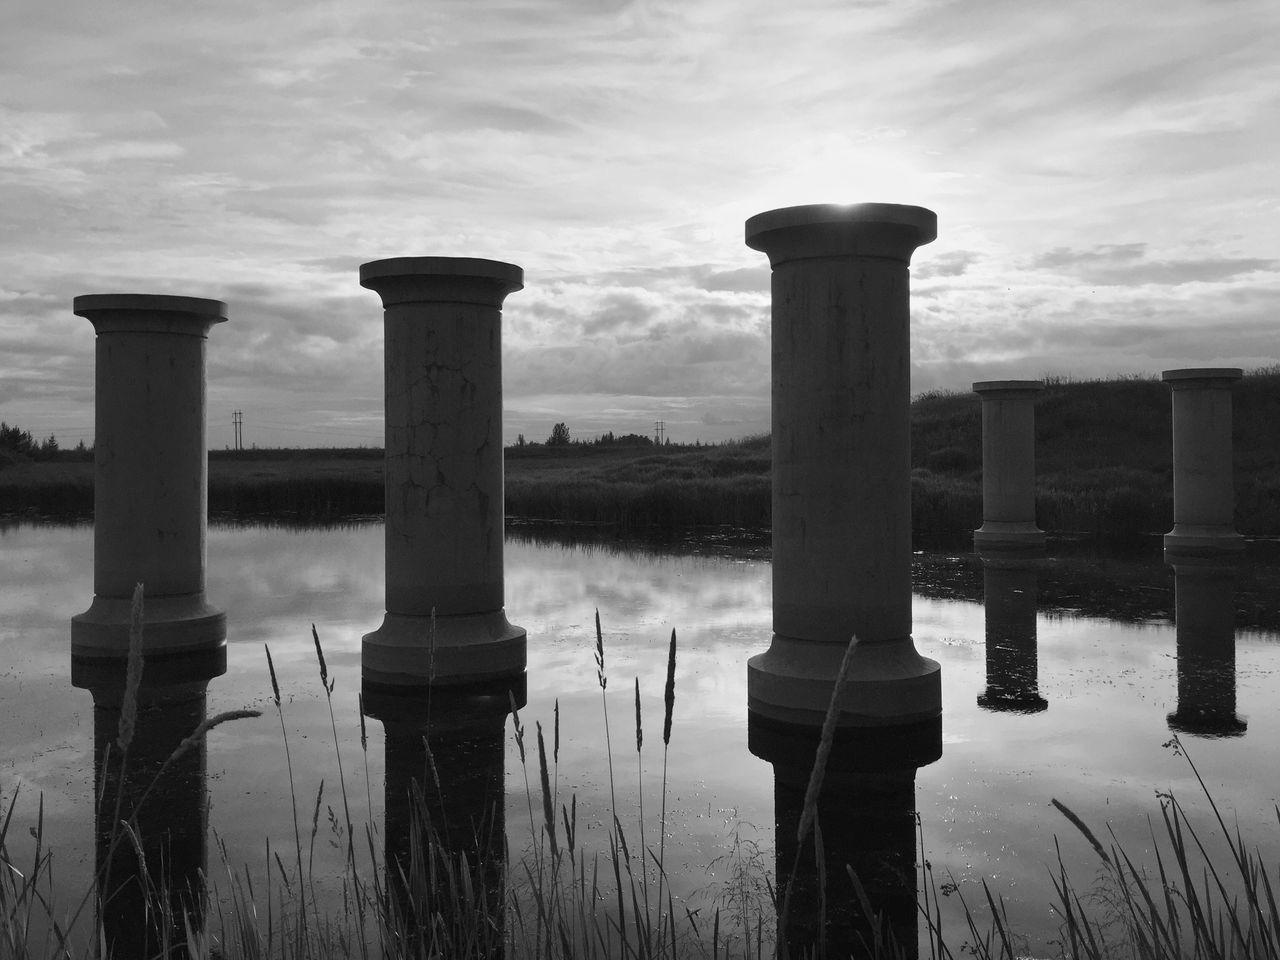 Pillars. Pillars Bridge Architecture Sunset River Landscape IPhoneography Iphone6 Blackandwhite Eyeem Canada Yeg St Albert Canada